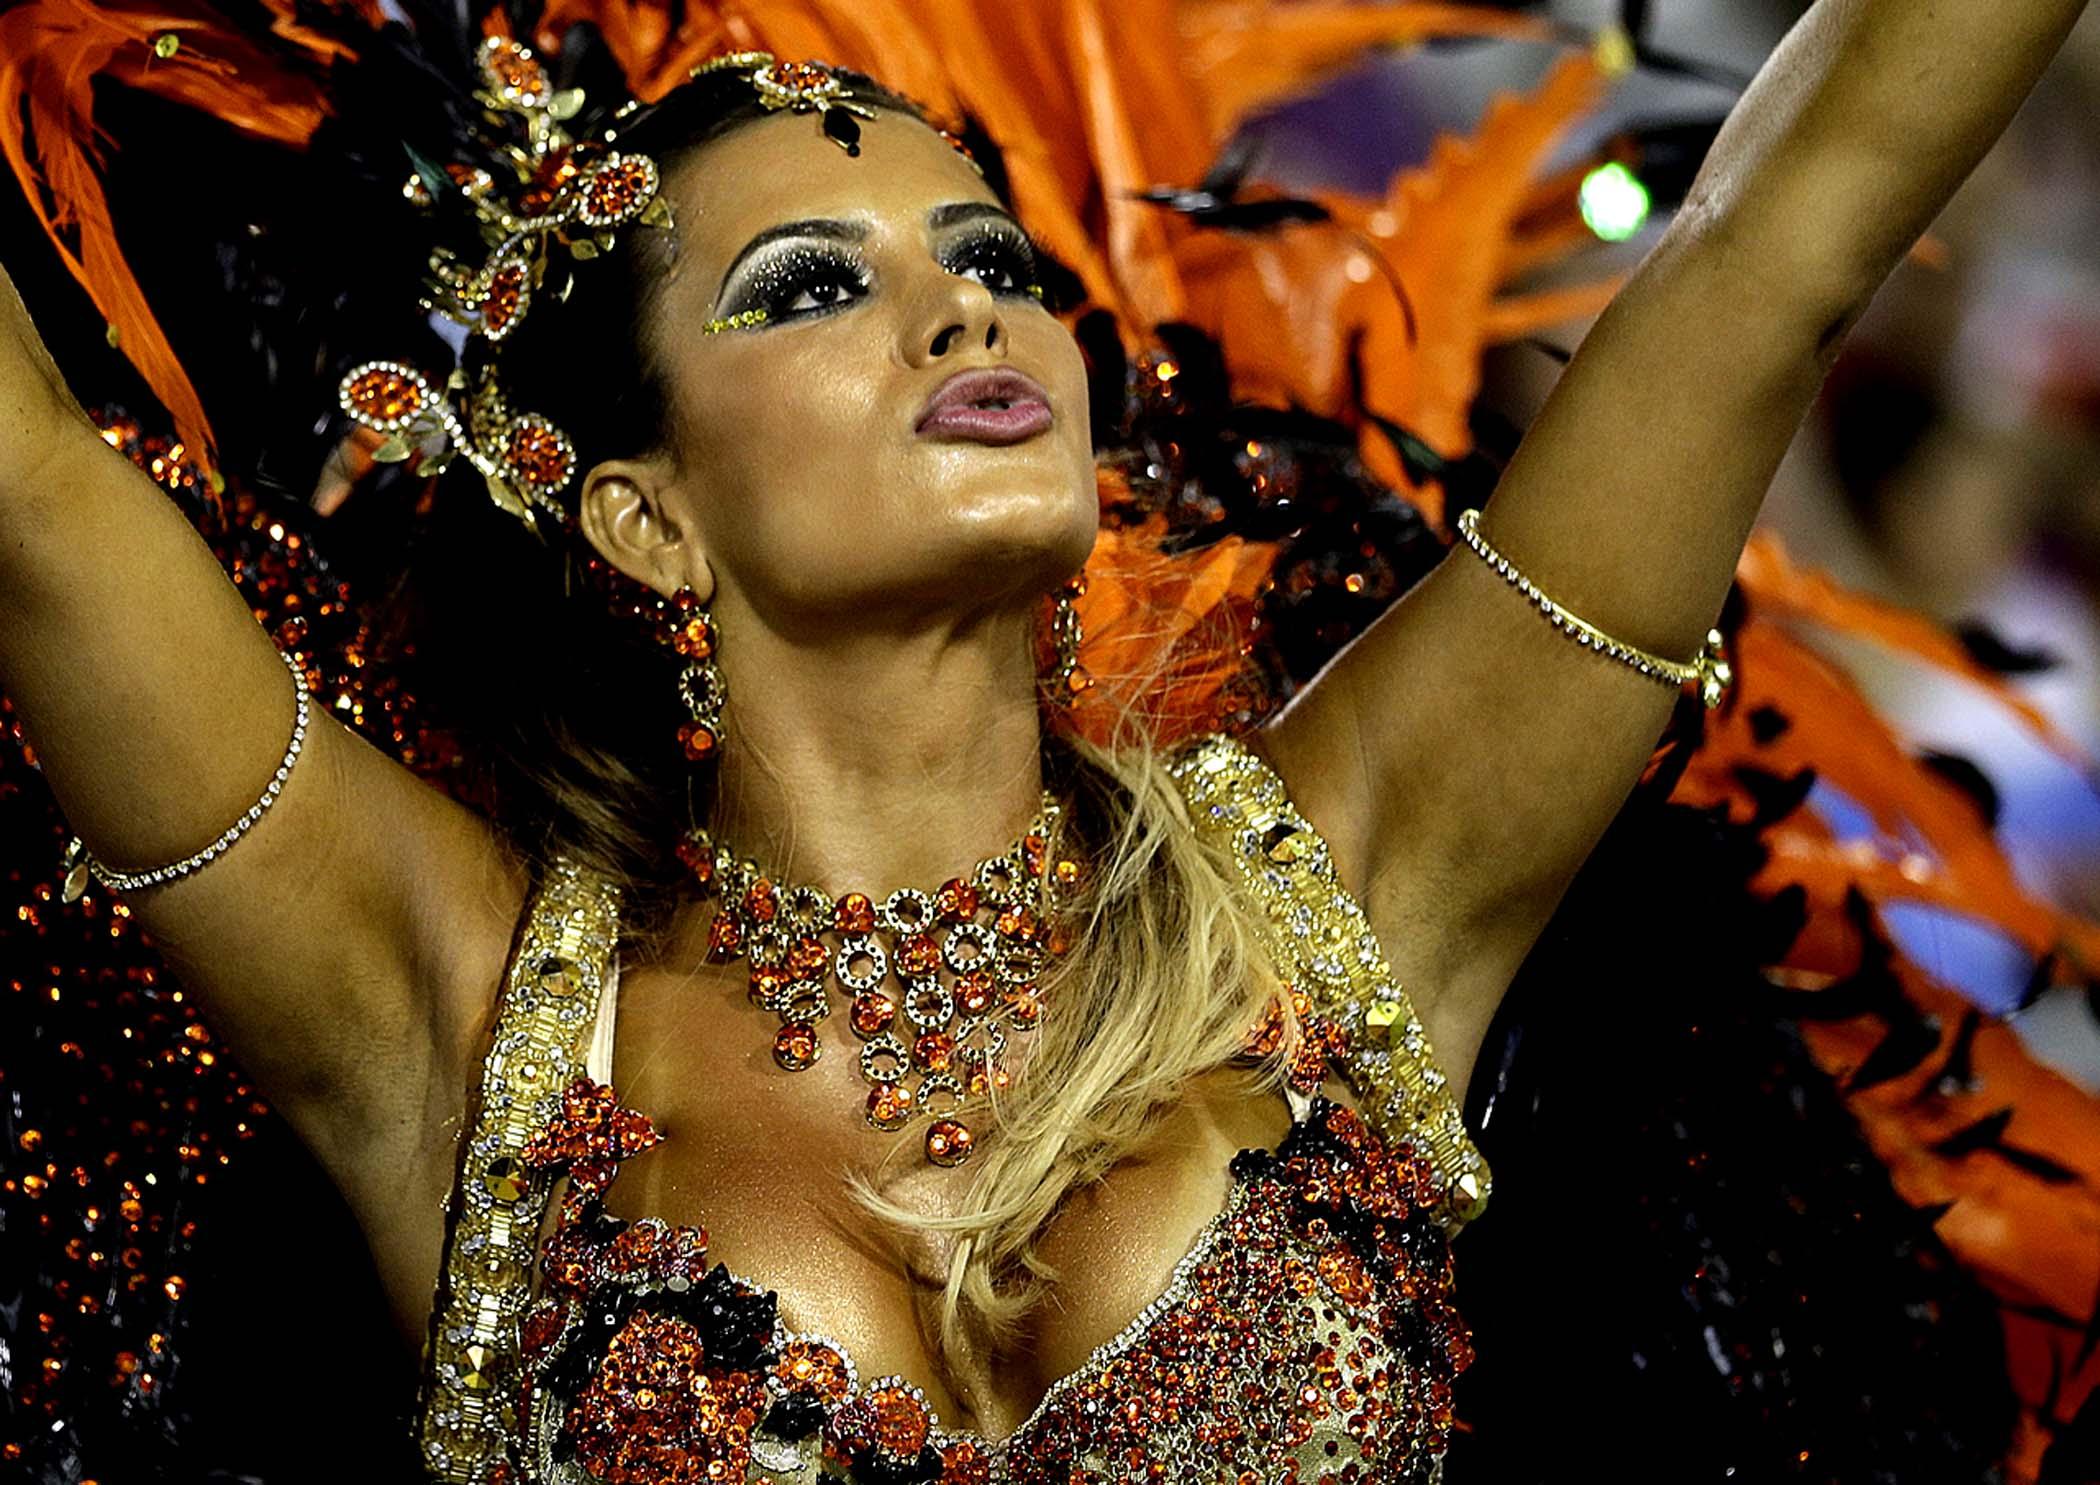 dancers Brazilian nude carnival